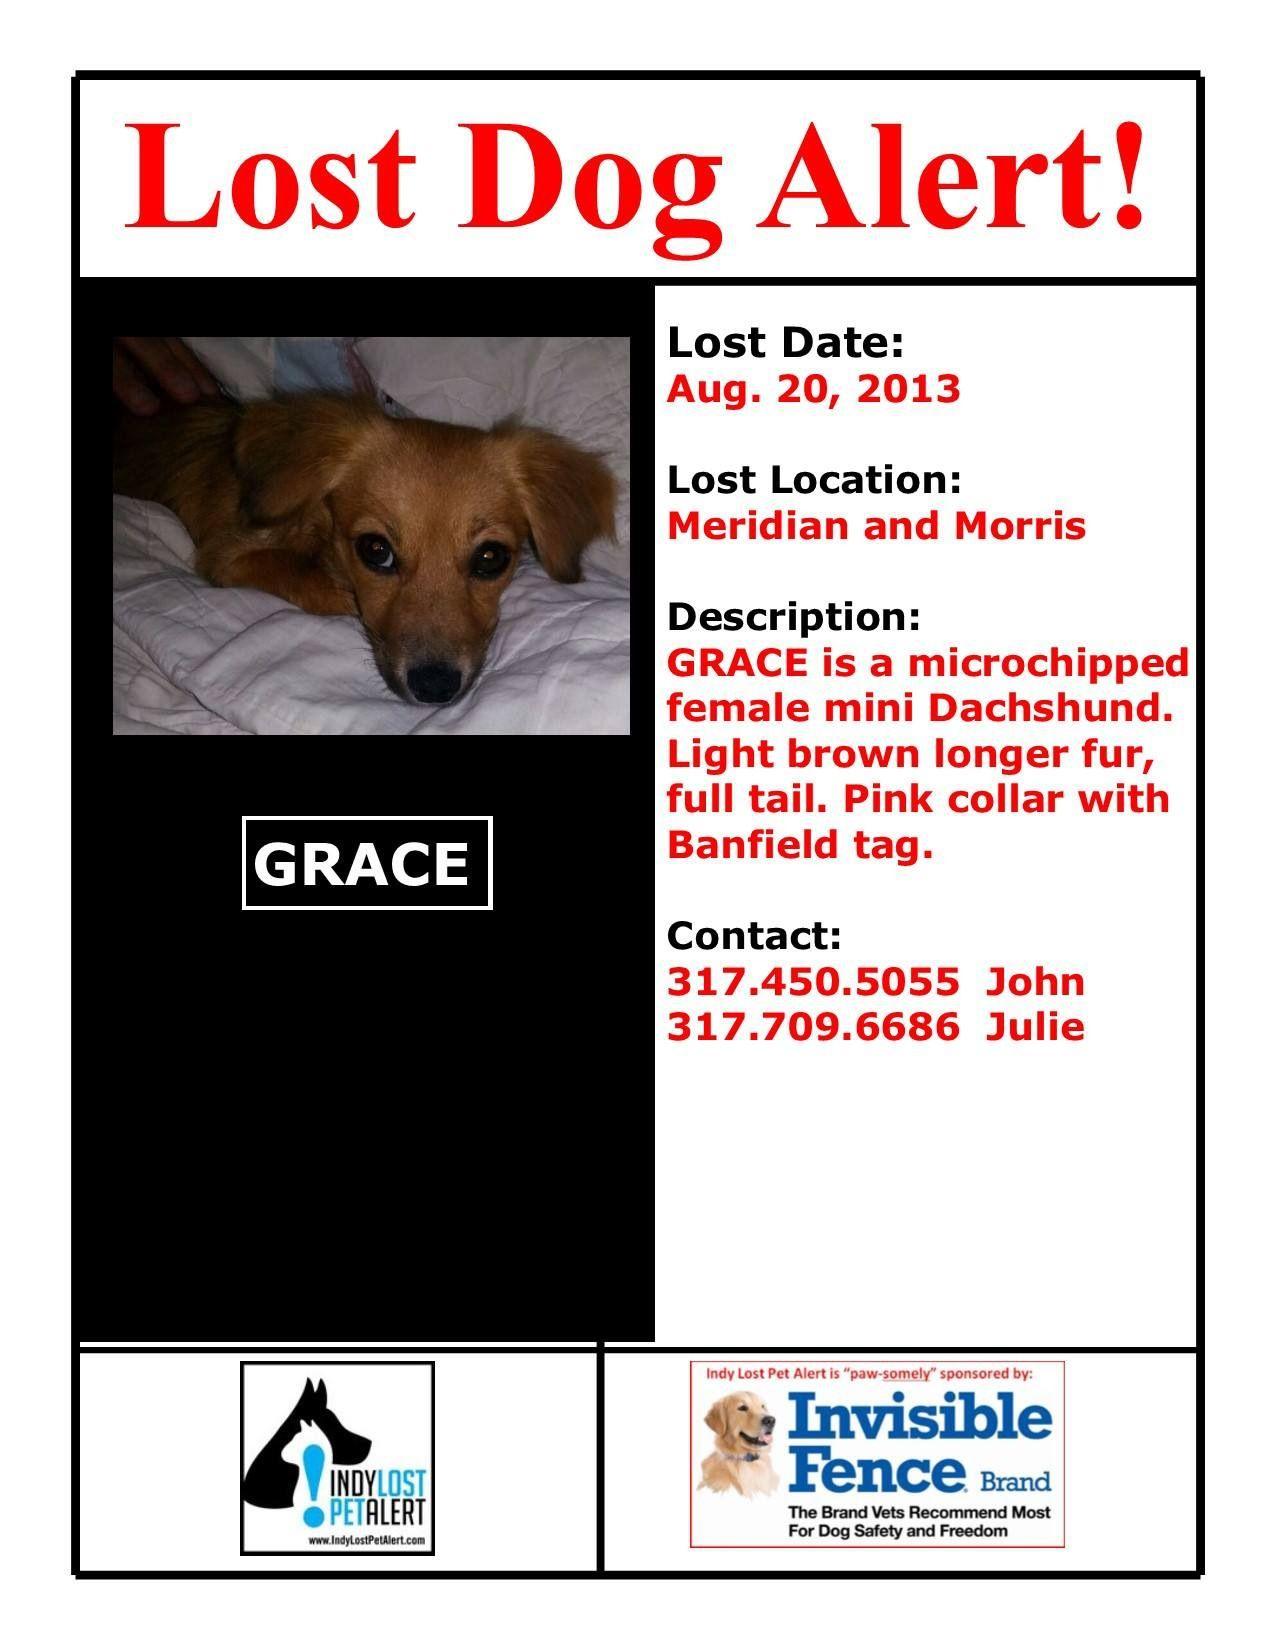 Indianapolis In Lostdog 8 20 13 Meridian And Morris Female Mini Dachshund Light Brown Longer Fur 317 450 5055 Http Losing A Dog Mini Dachshund Losing A Pet